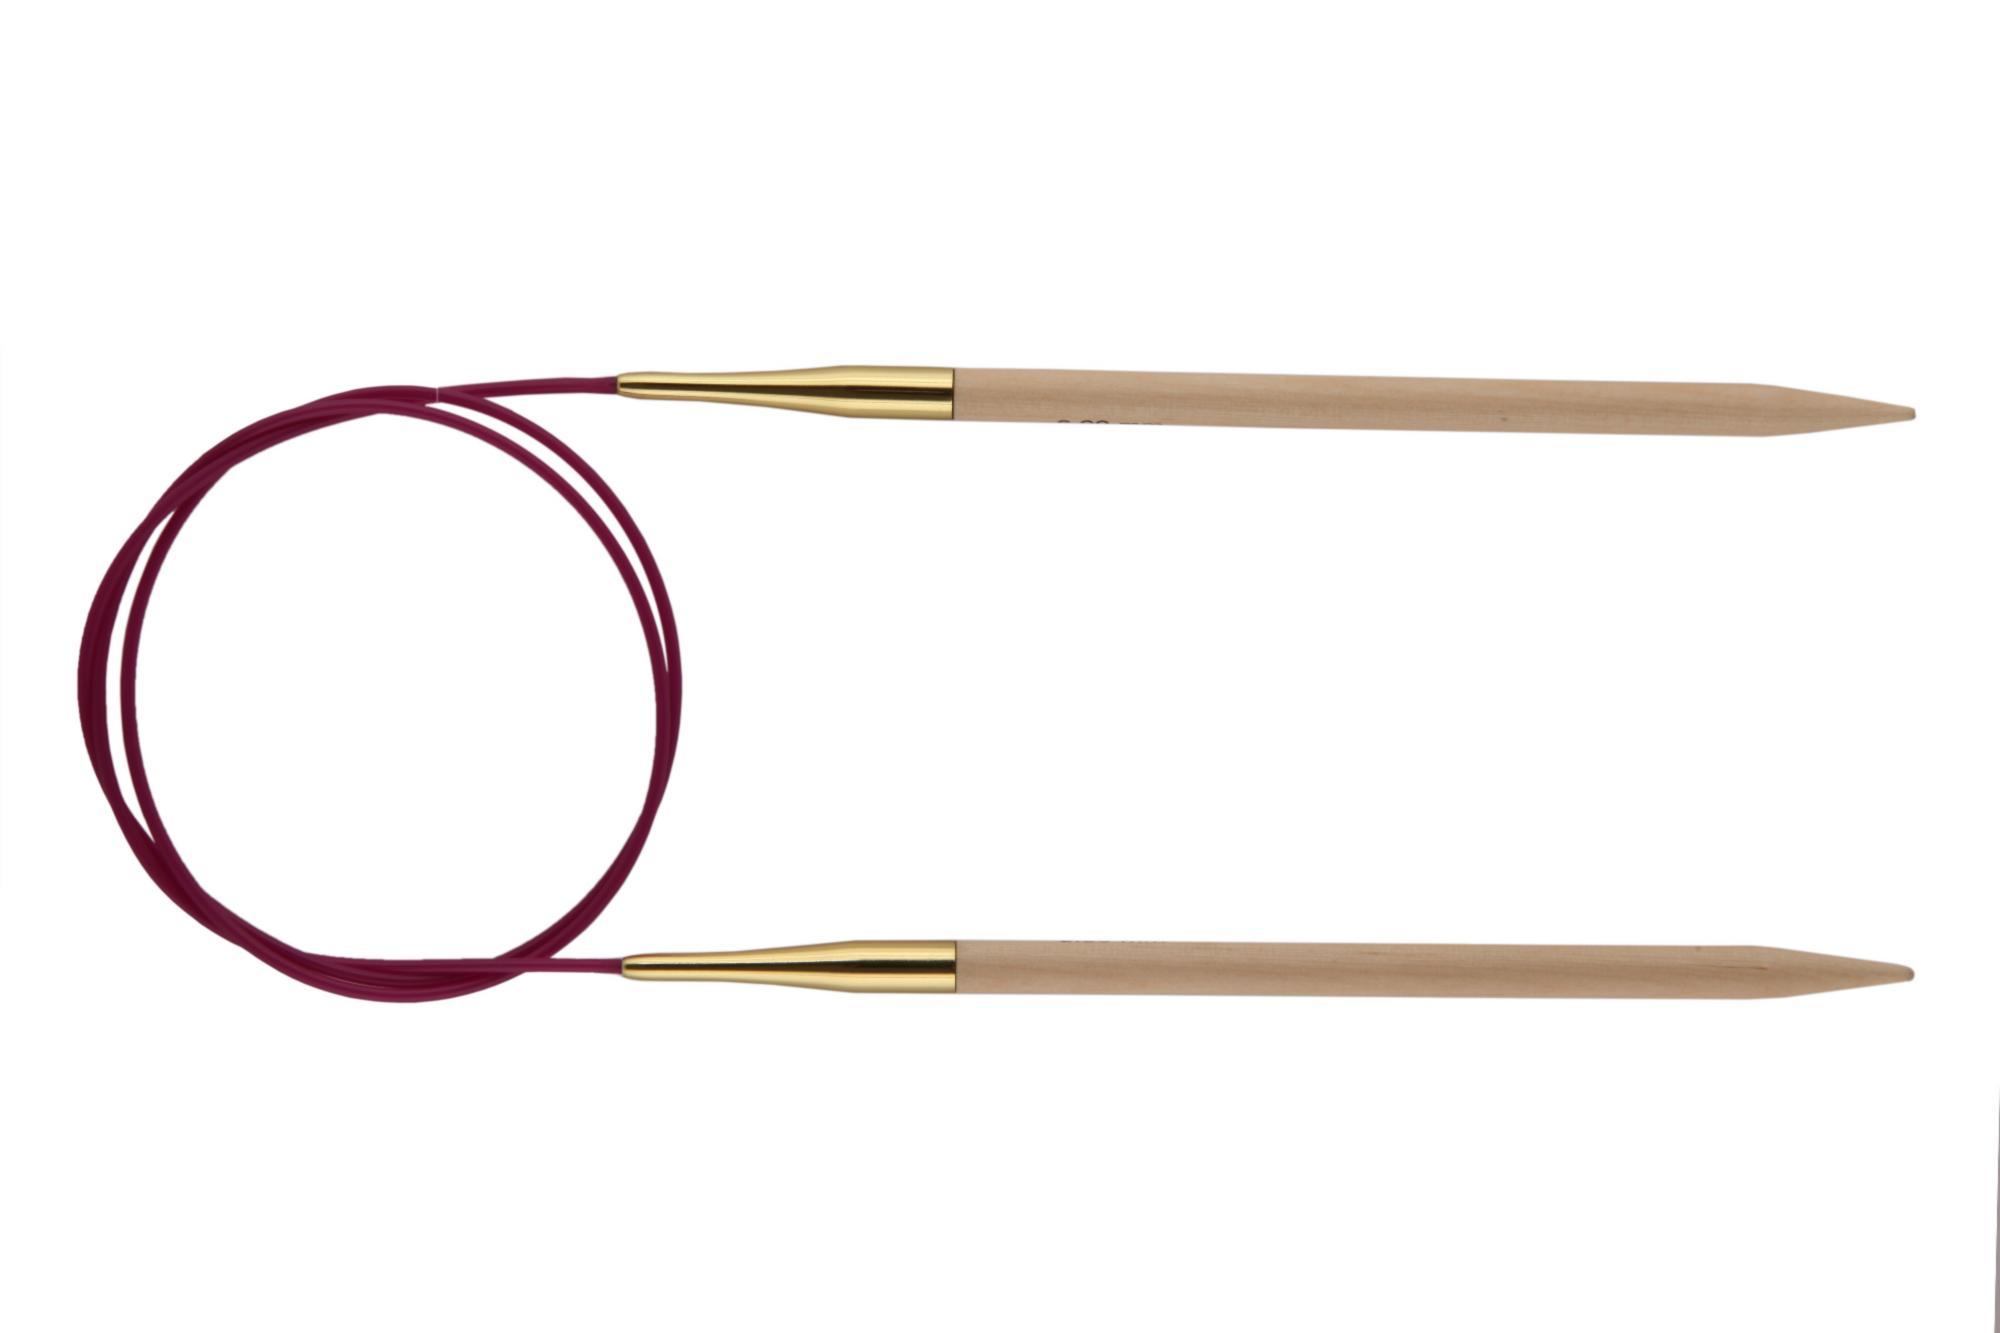 Спицы круговые 40 см Basix Birch Wood KnitPro, 35308, 4.00 мм